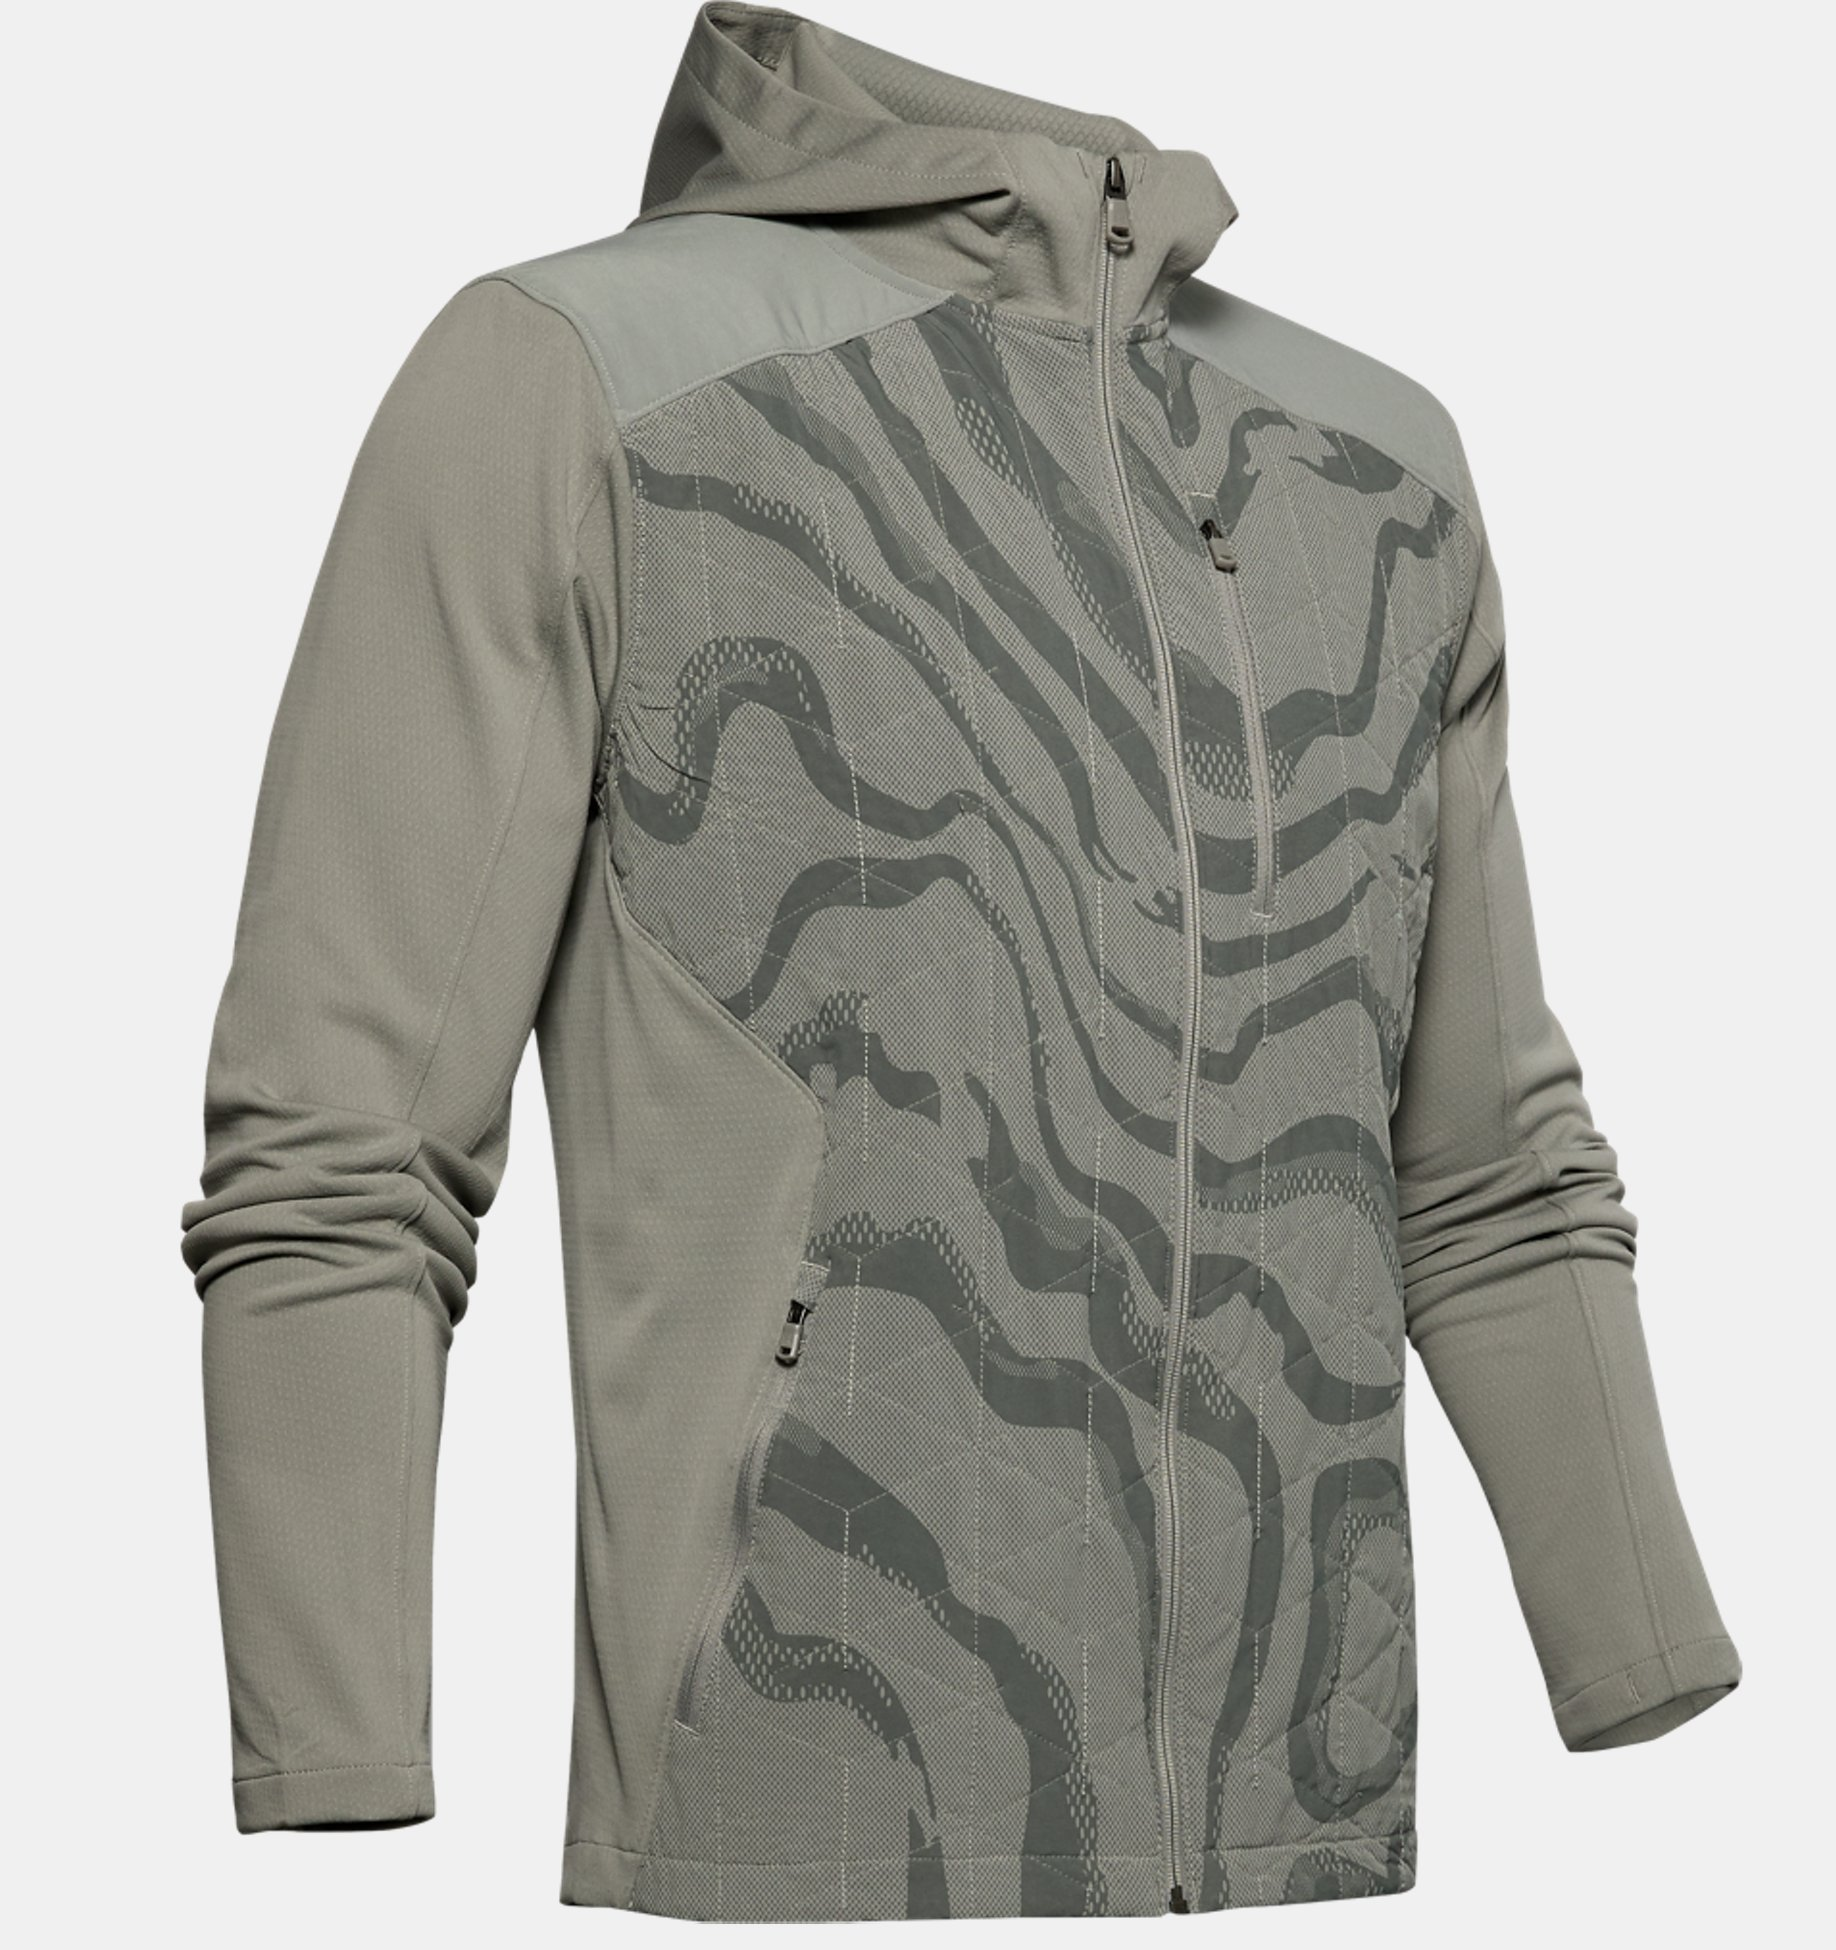 Men's ColdGear® Reactor Hybrid Lite Print Jacket | Under